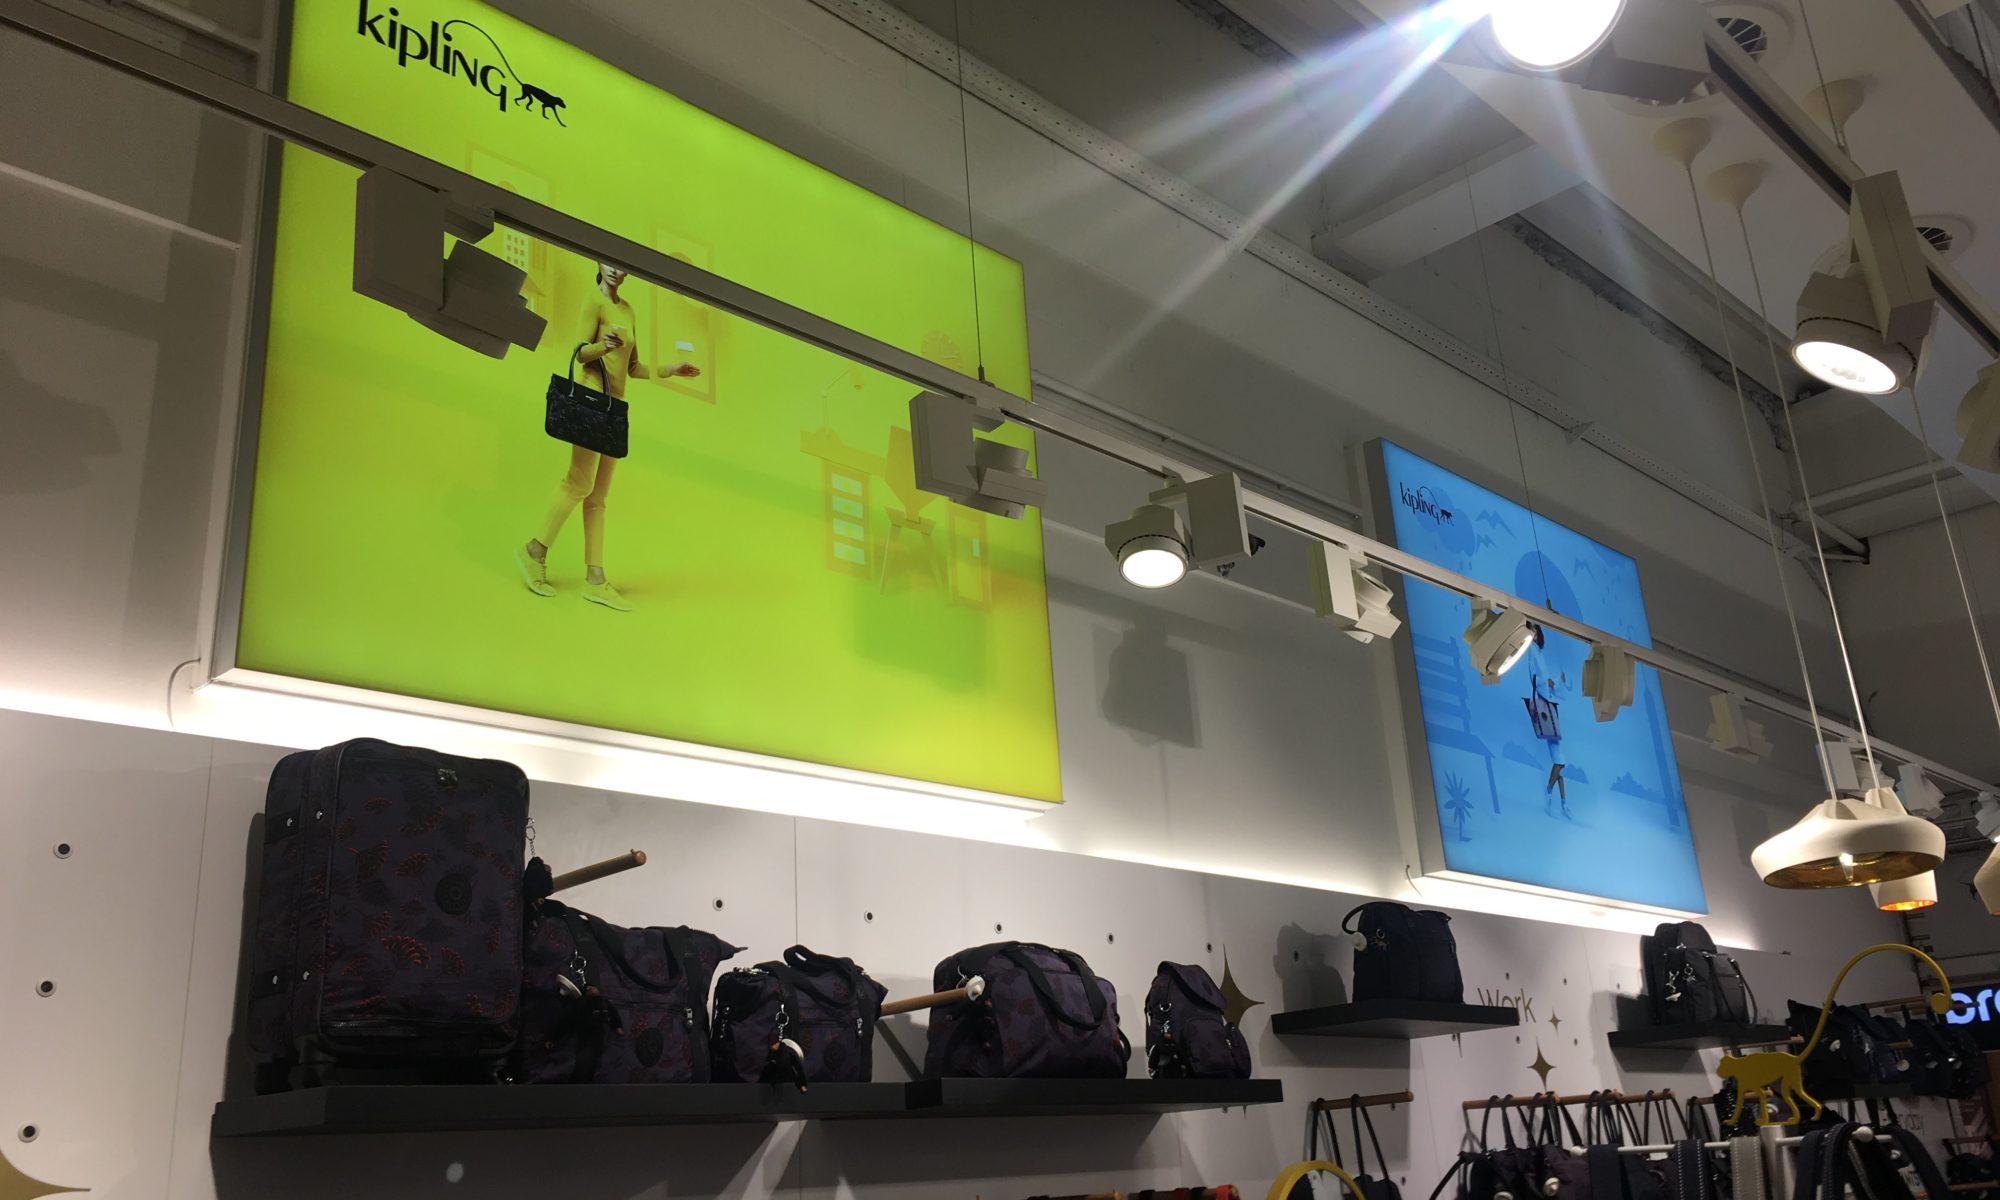 Retail installations